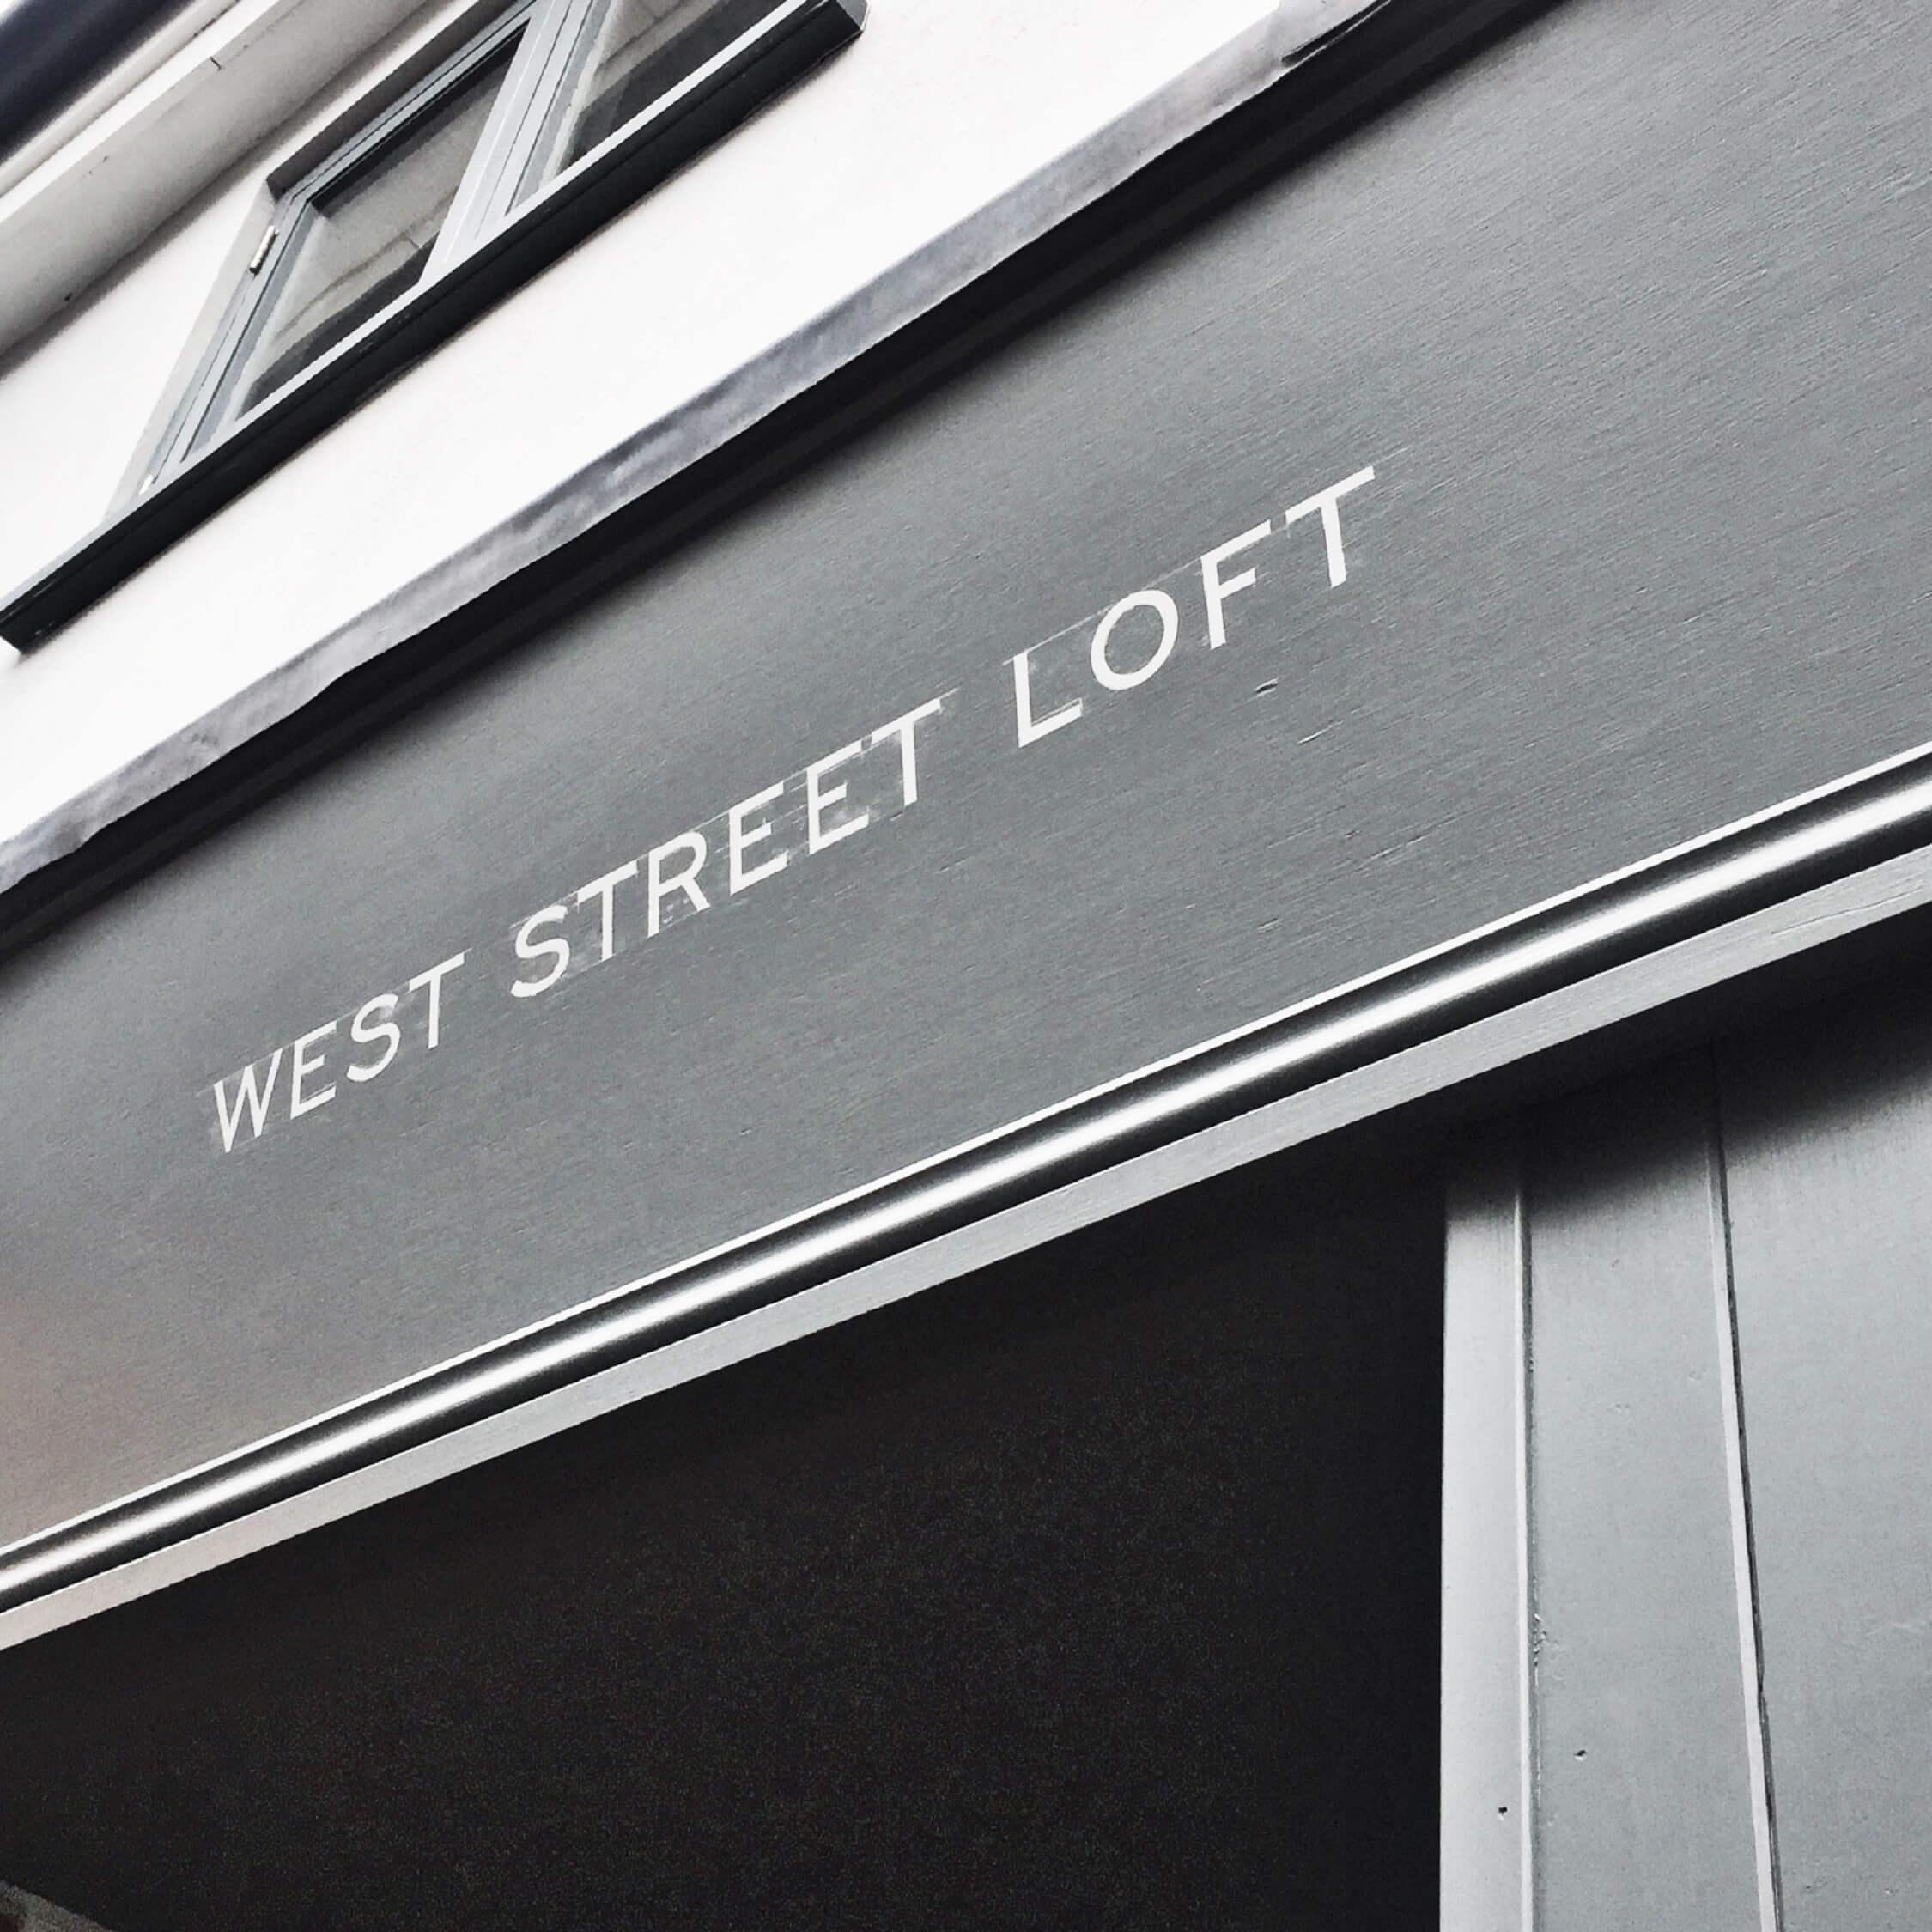 West Street Loft sign